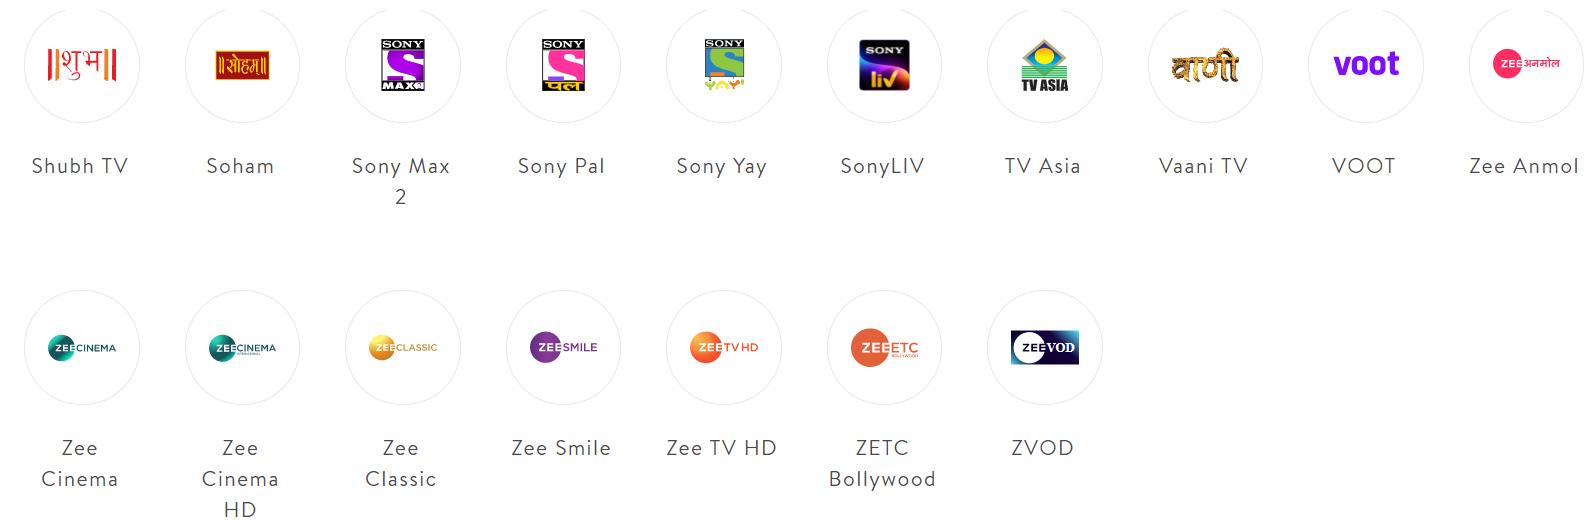 Sling TV Hindi Entertainment Channel